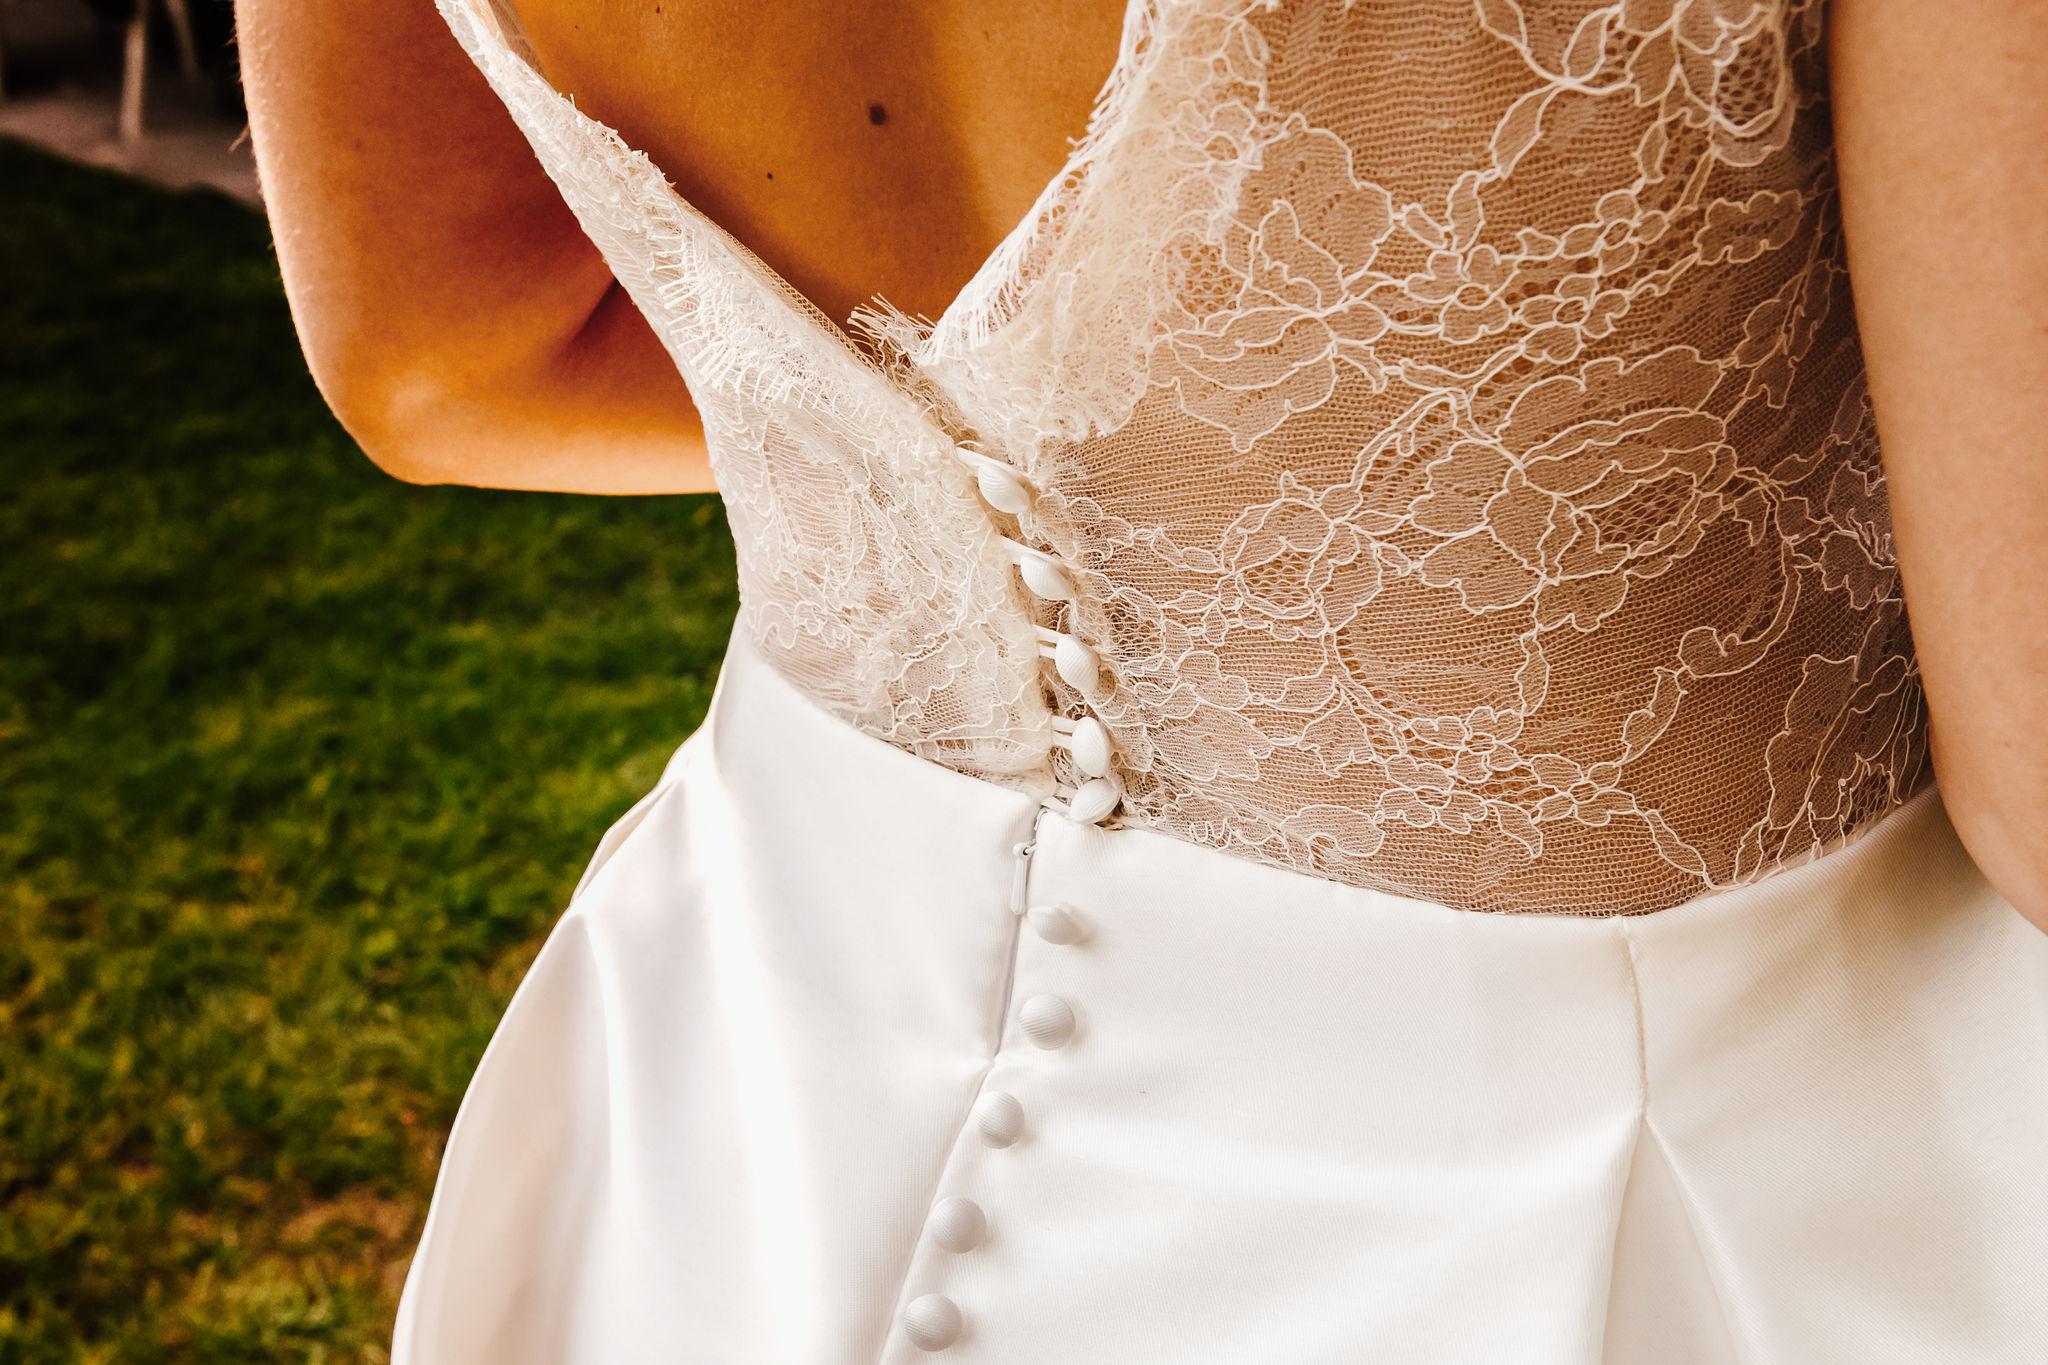 fiesta-fields-louisa-thomas-blog-dress-detail-abigailwhite.jpg